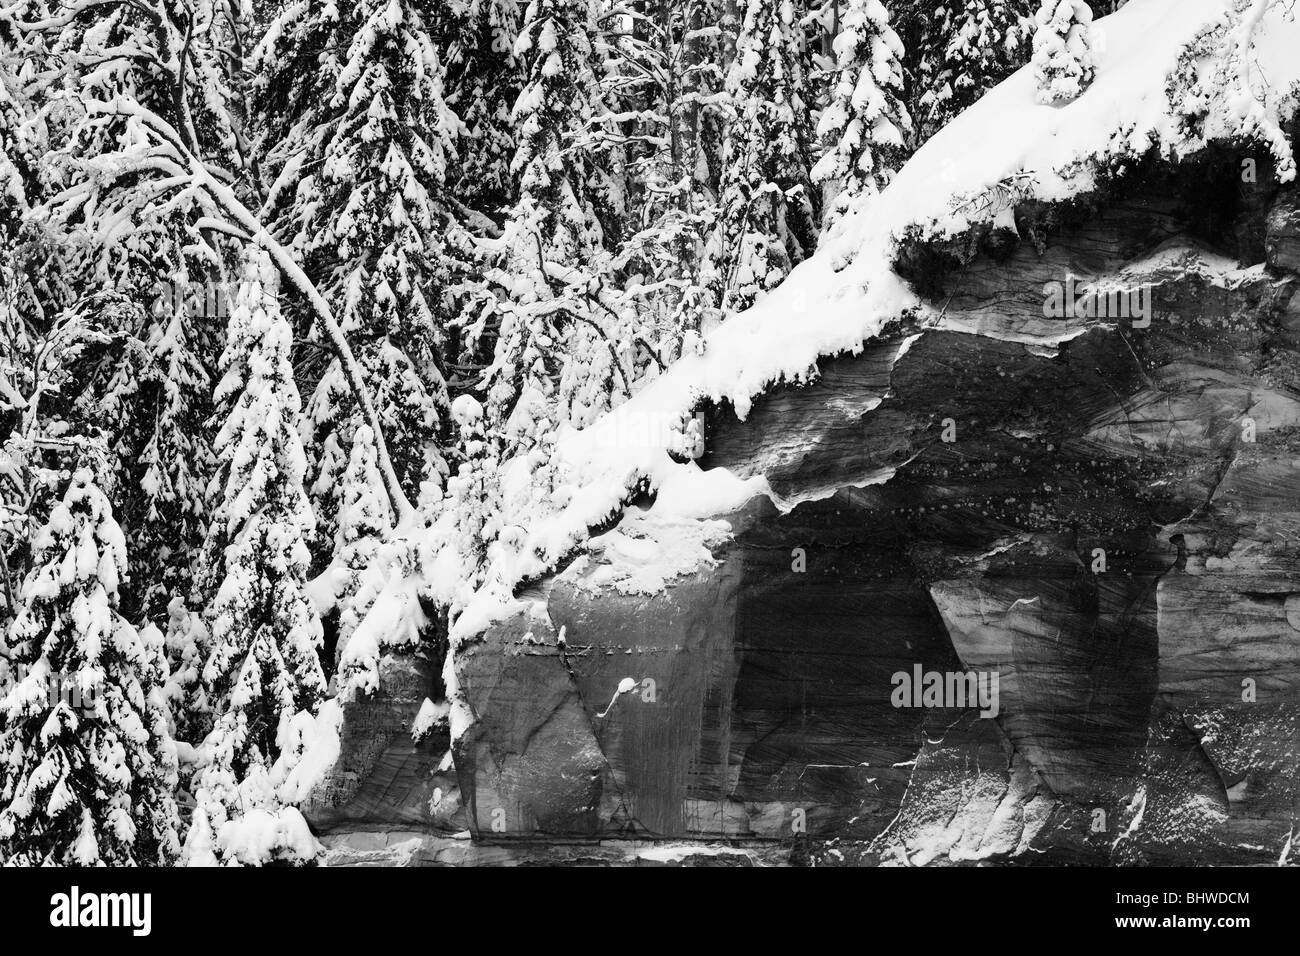 Norway spruce woodland on sandstone cliff - Stock Image